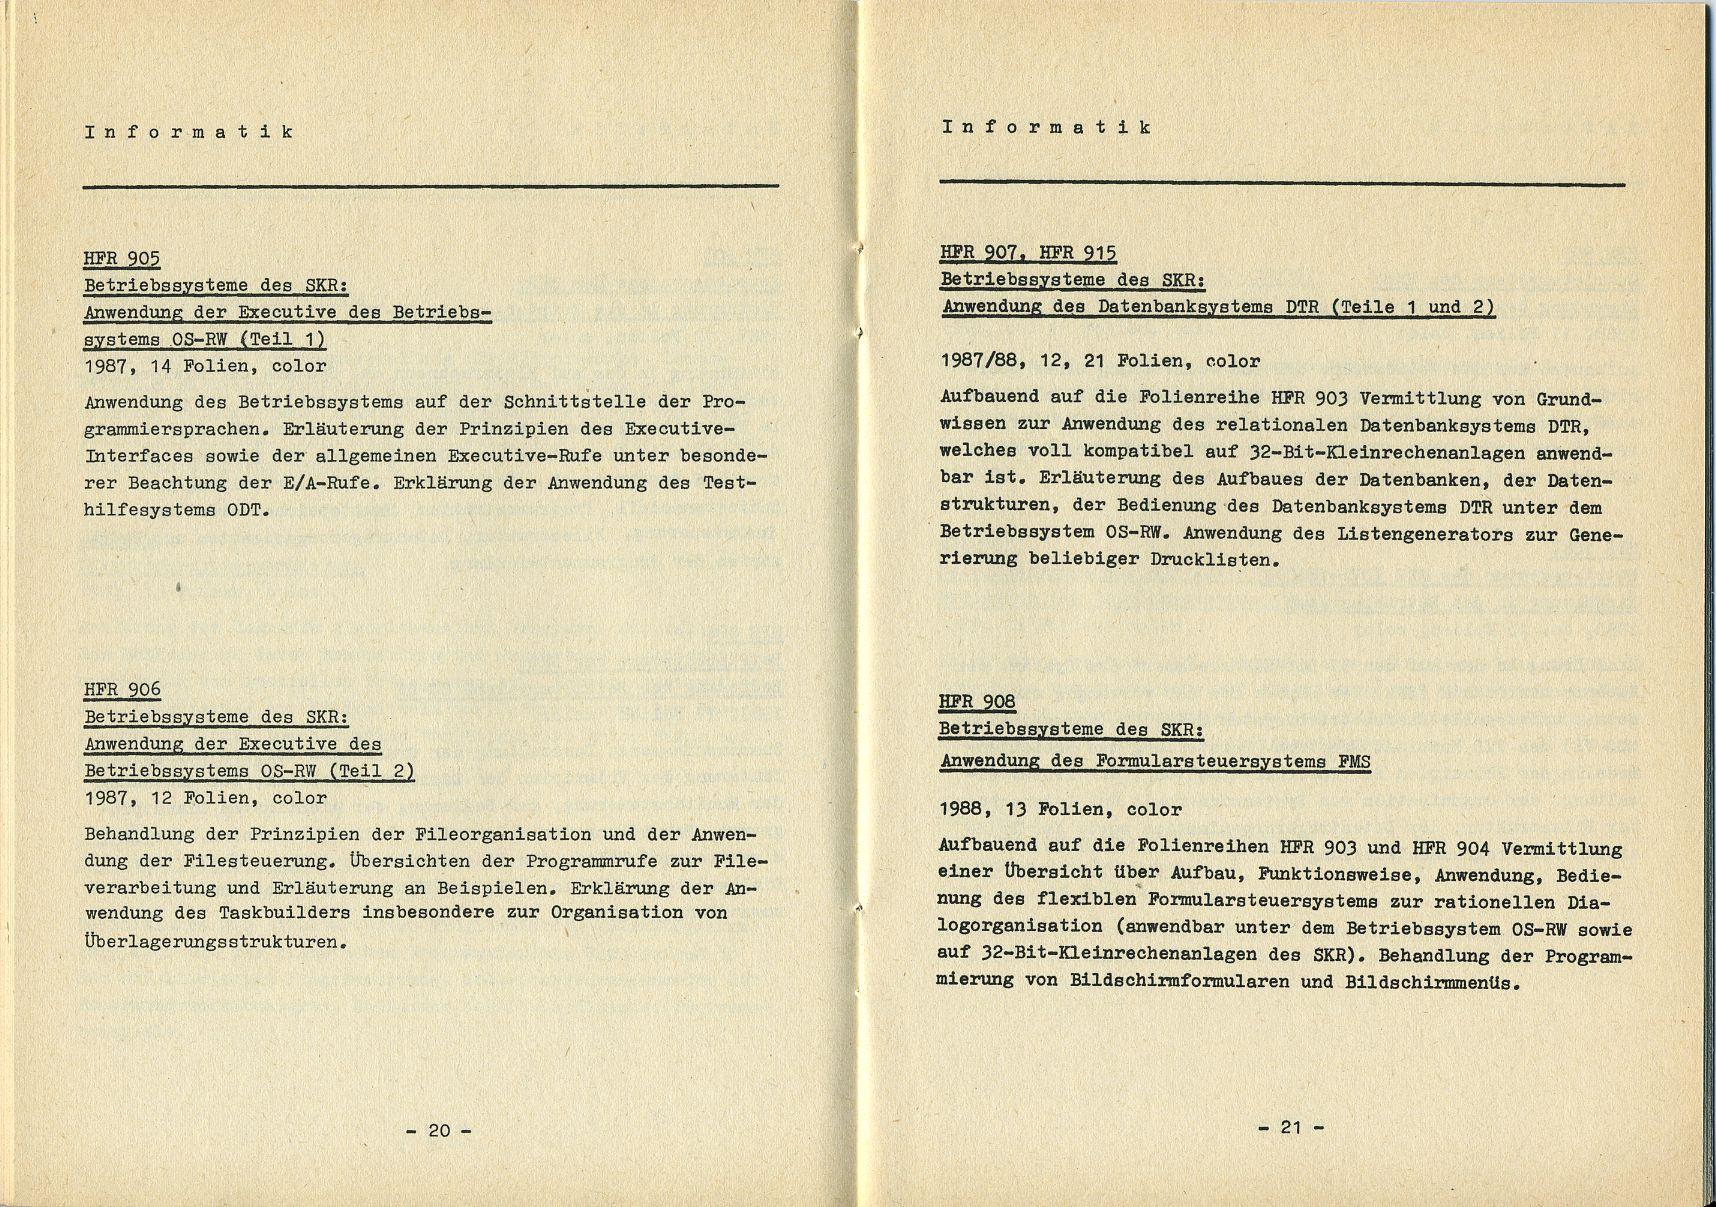 IFBT - Katalog - Informatik